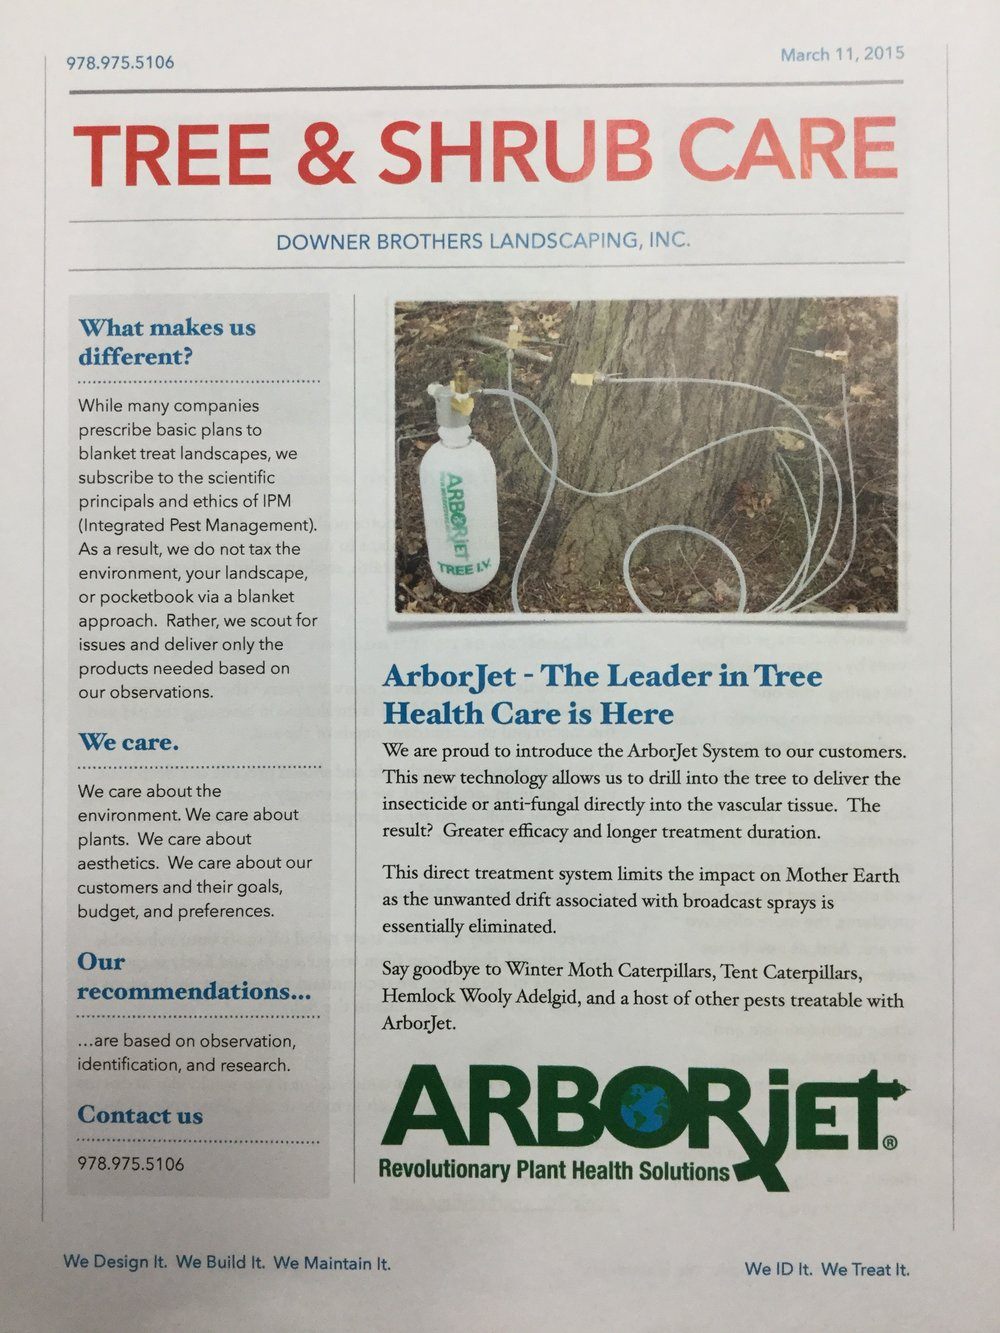 Tree & Shrub Care 03.11.2015 (2).JPG